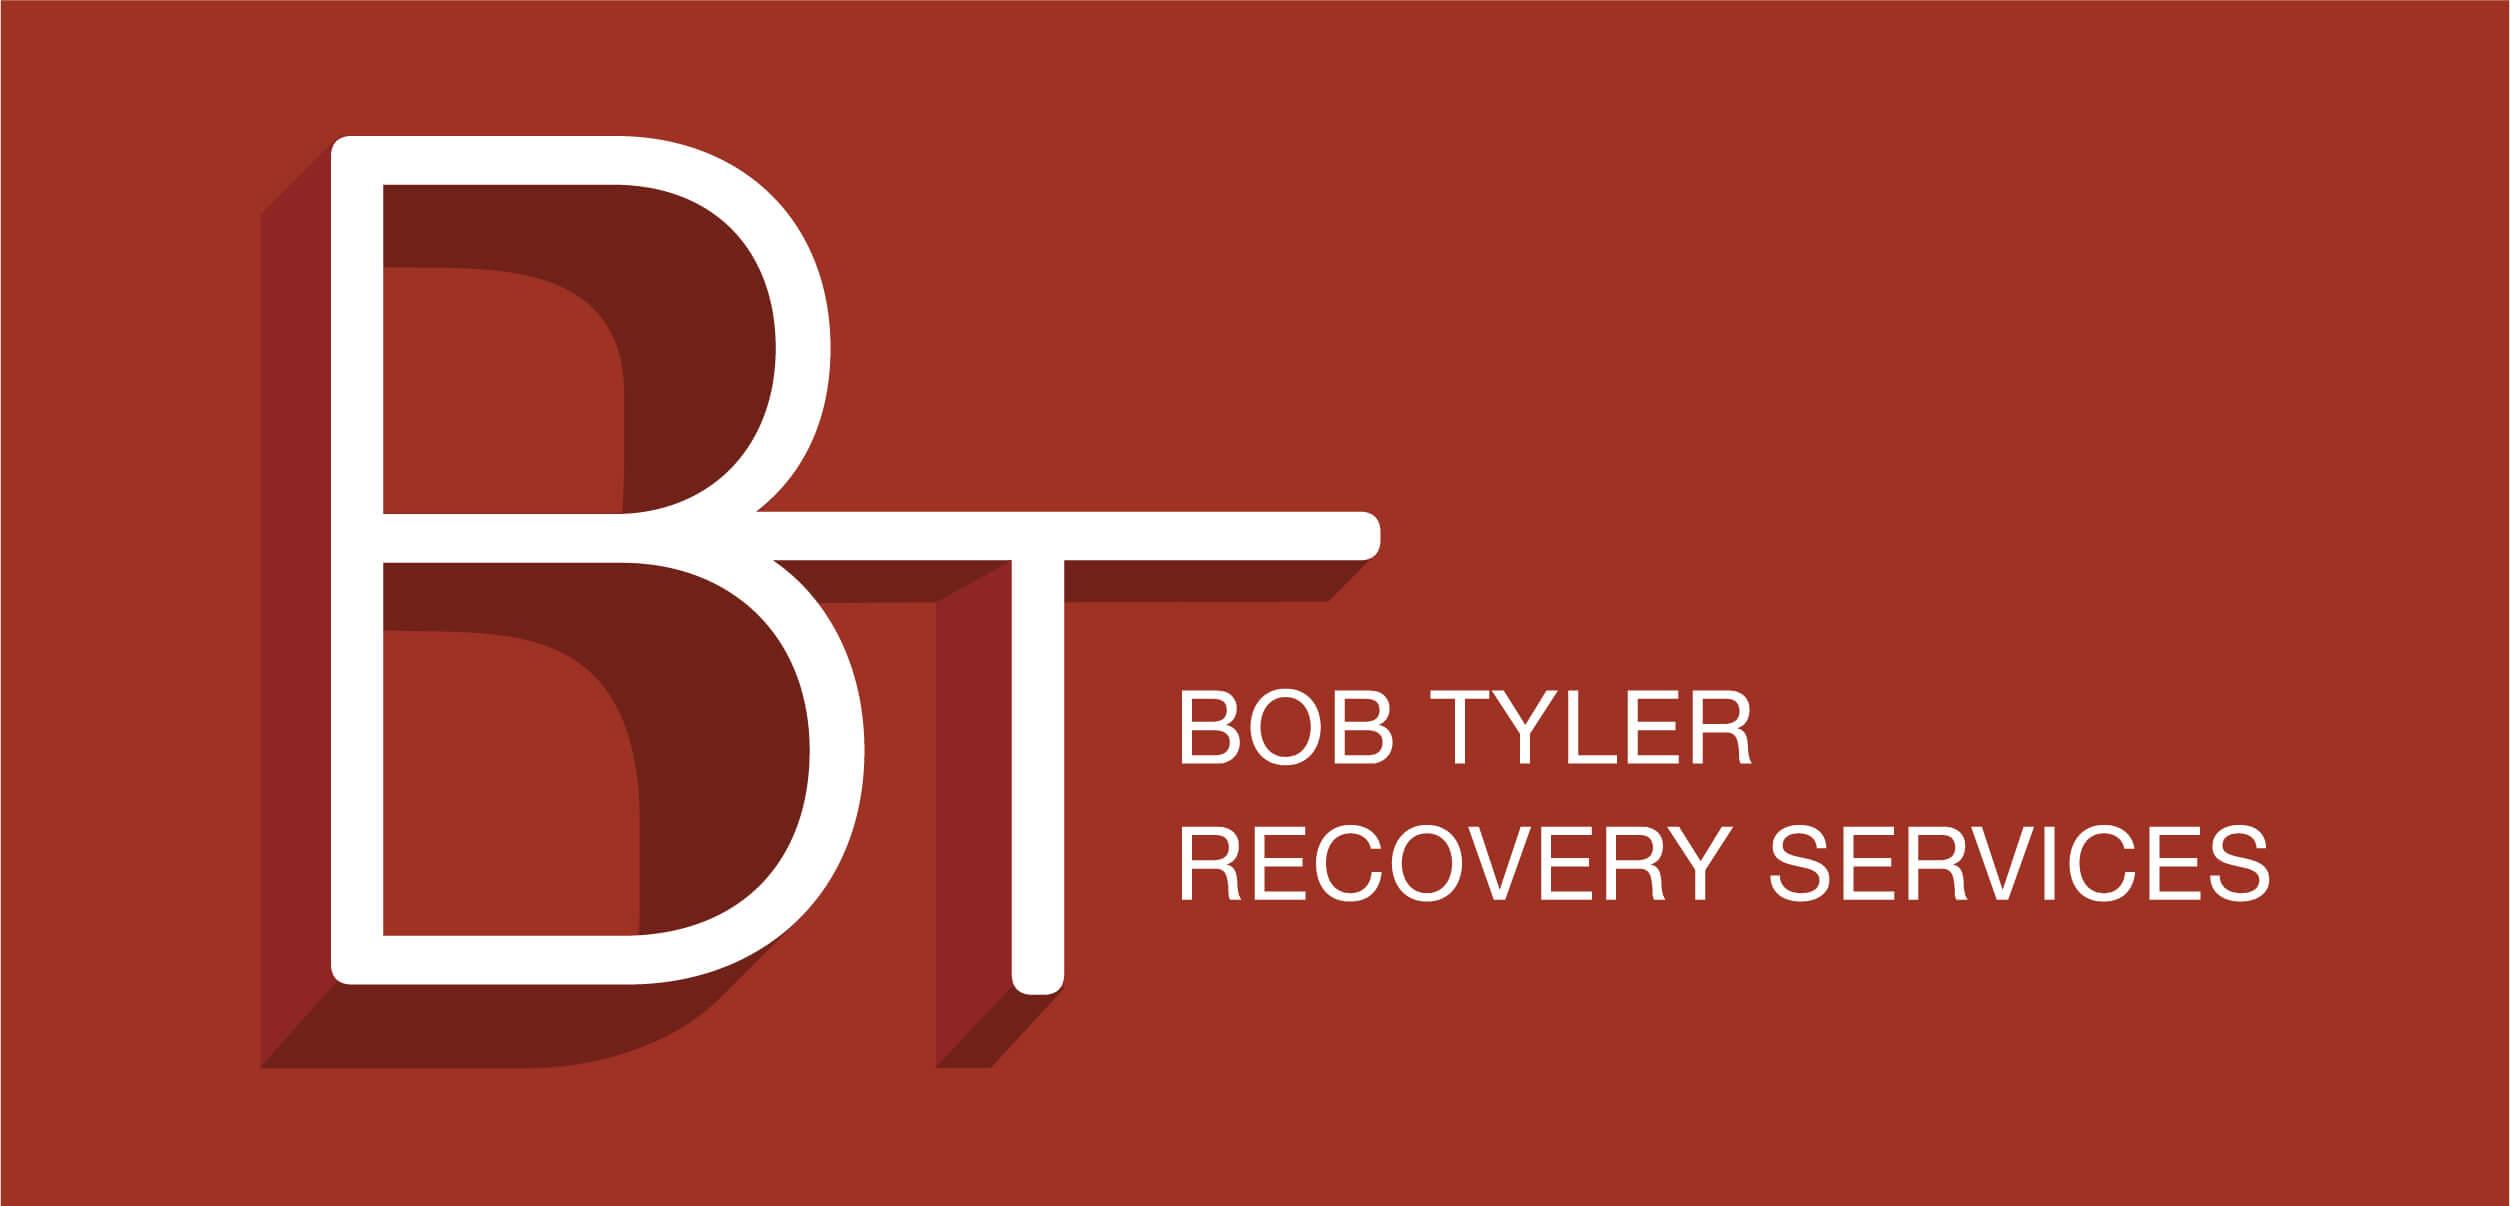 Bob Tyler Recovery Services Logo